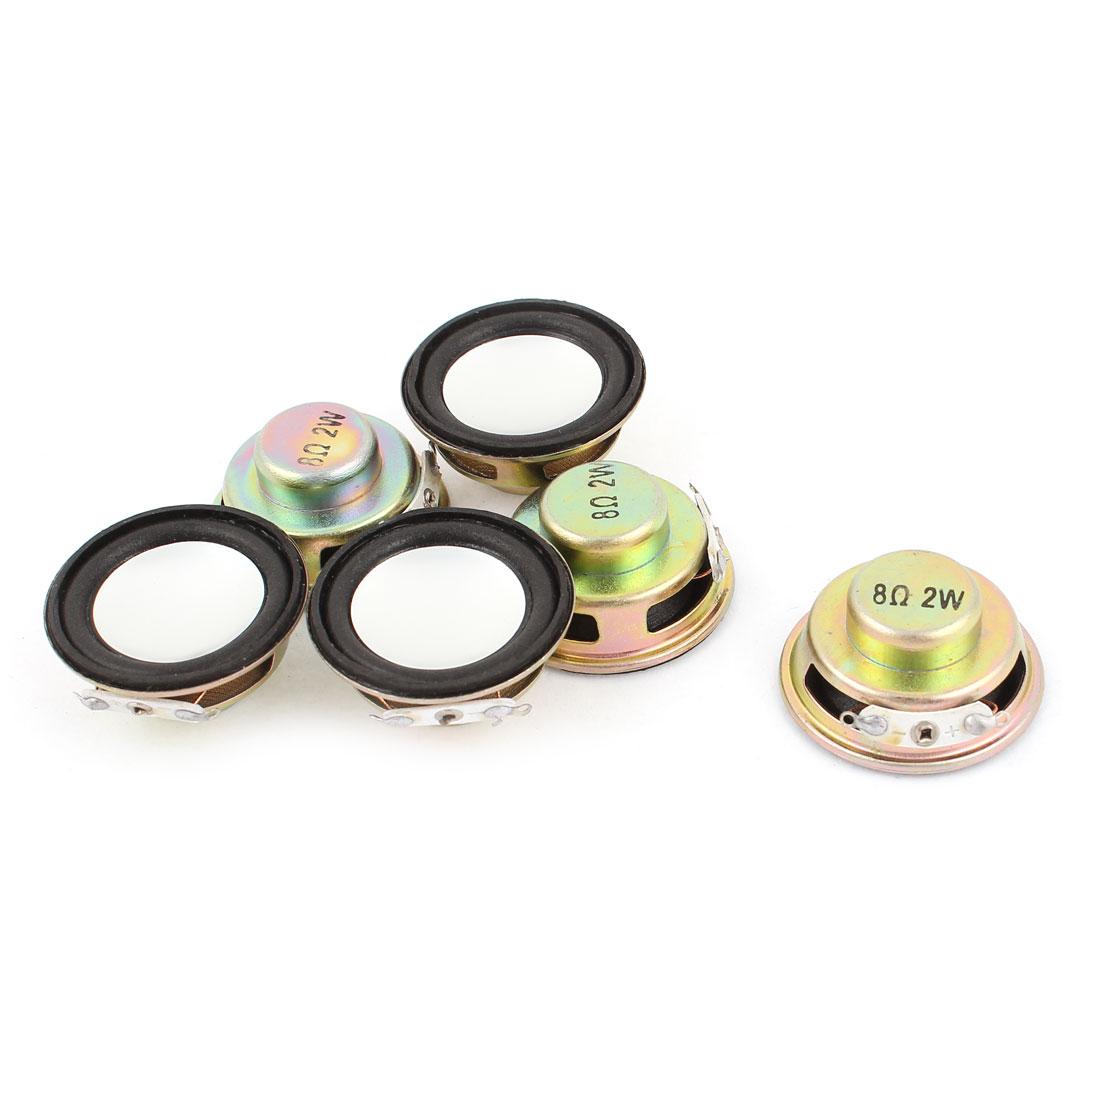 6pcs 8Ohm 2W 36mm Diameter Round Metal Shell Audio Speaker Horn